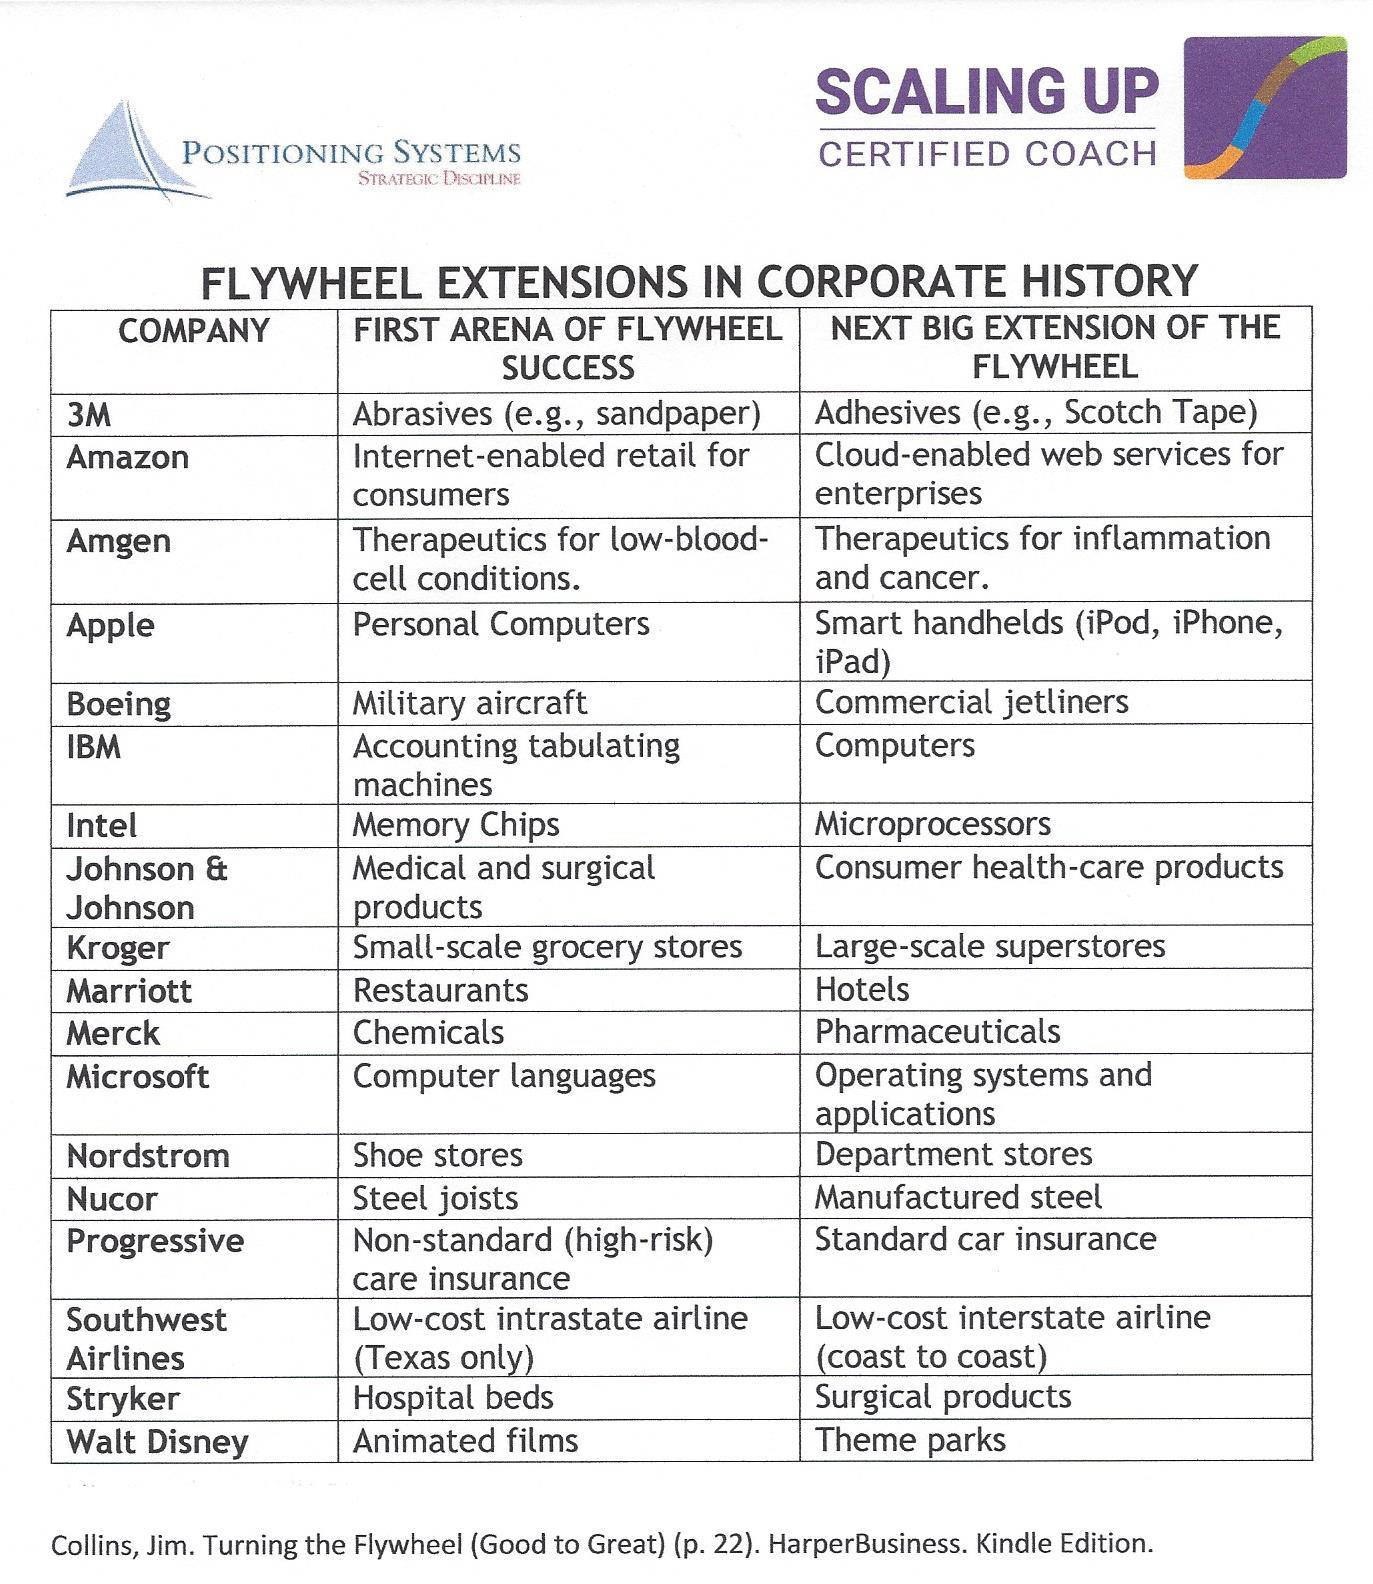 Flywheel Extensions in Corporate HistoryI